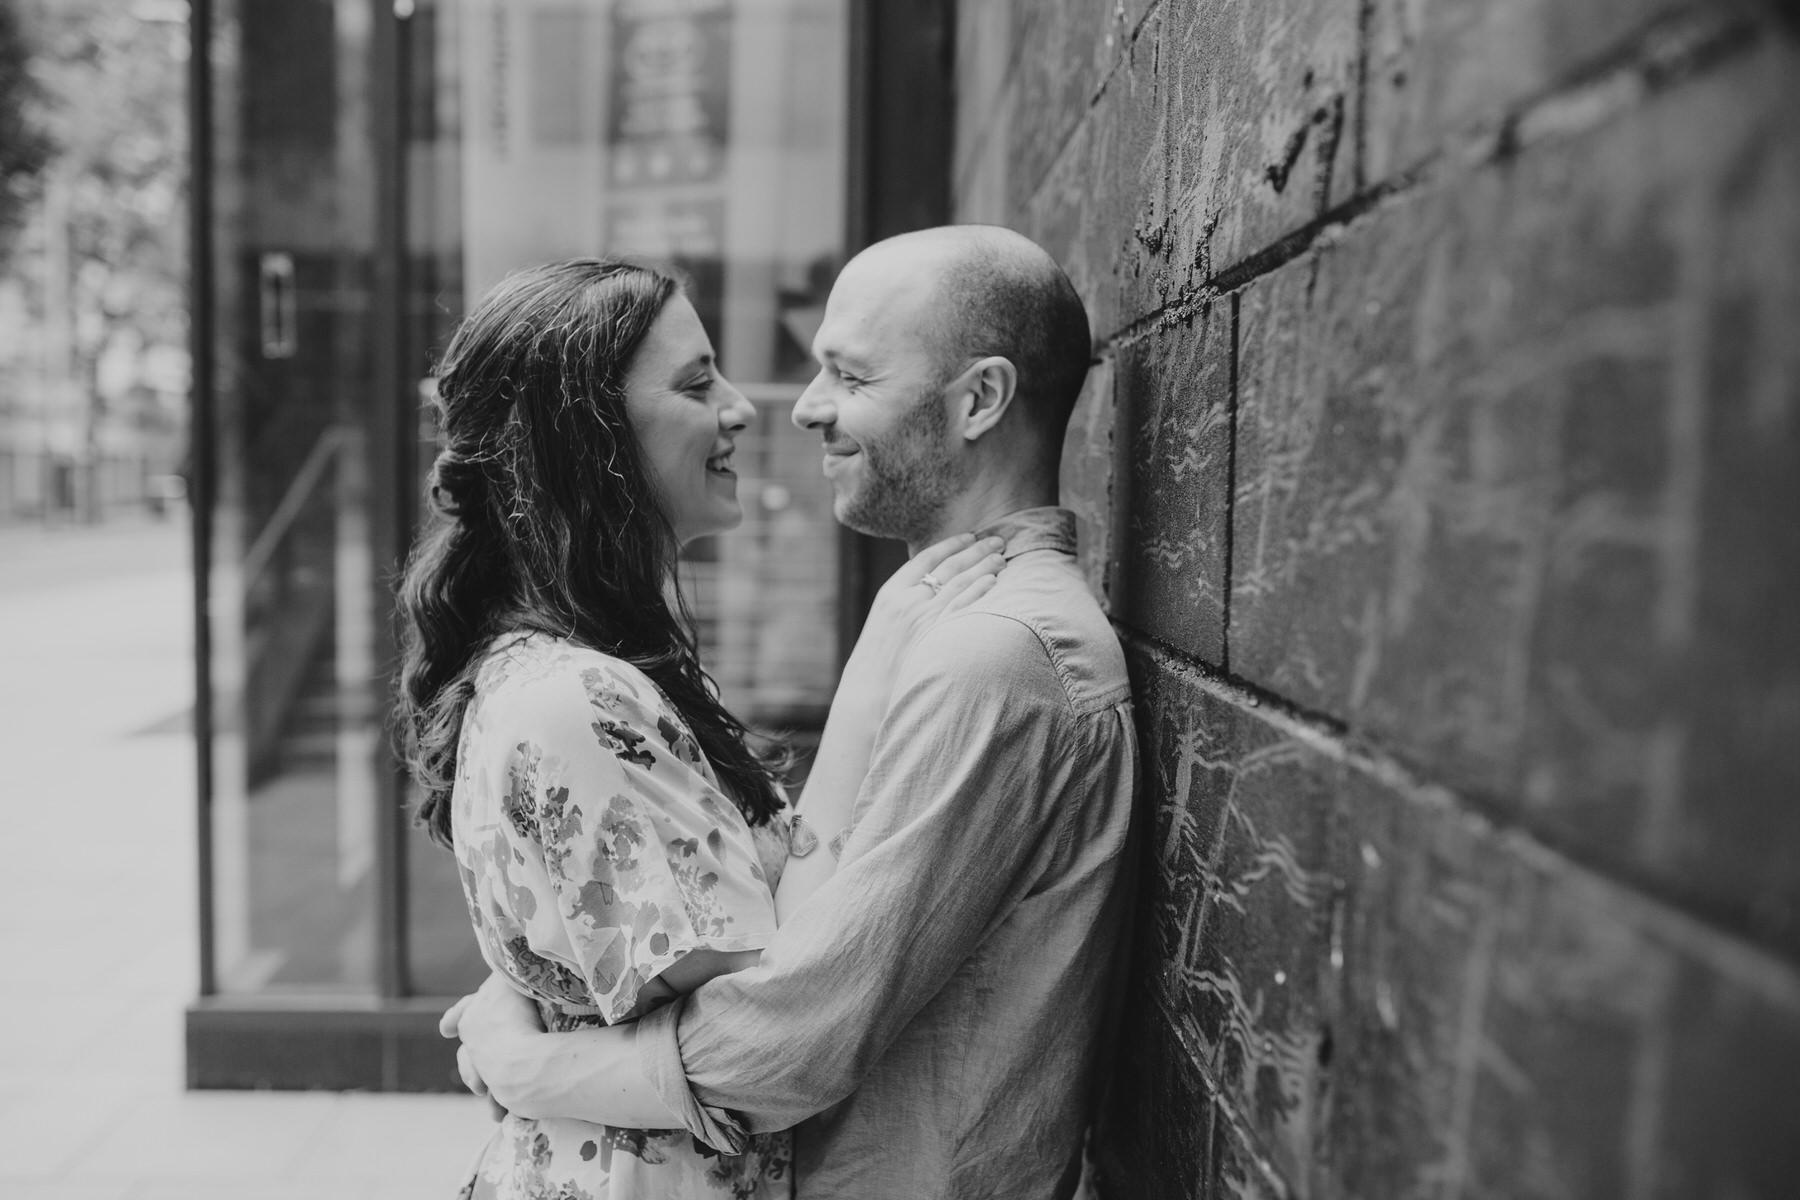 16-couple cuddling against urban background London.jpg